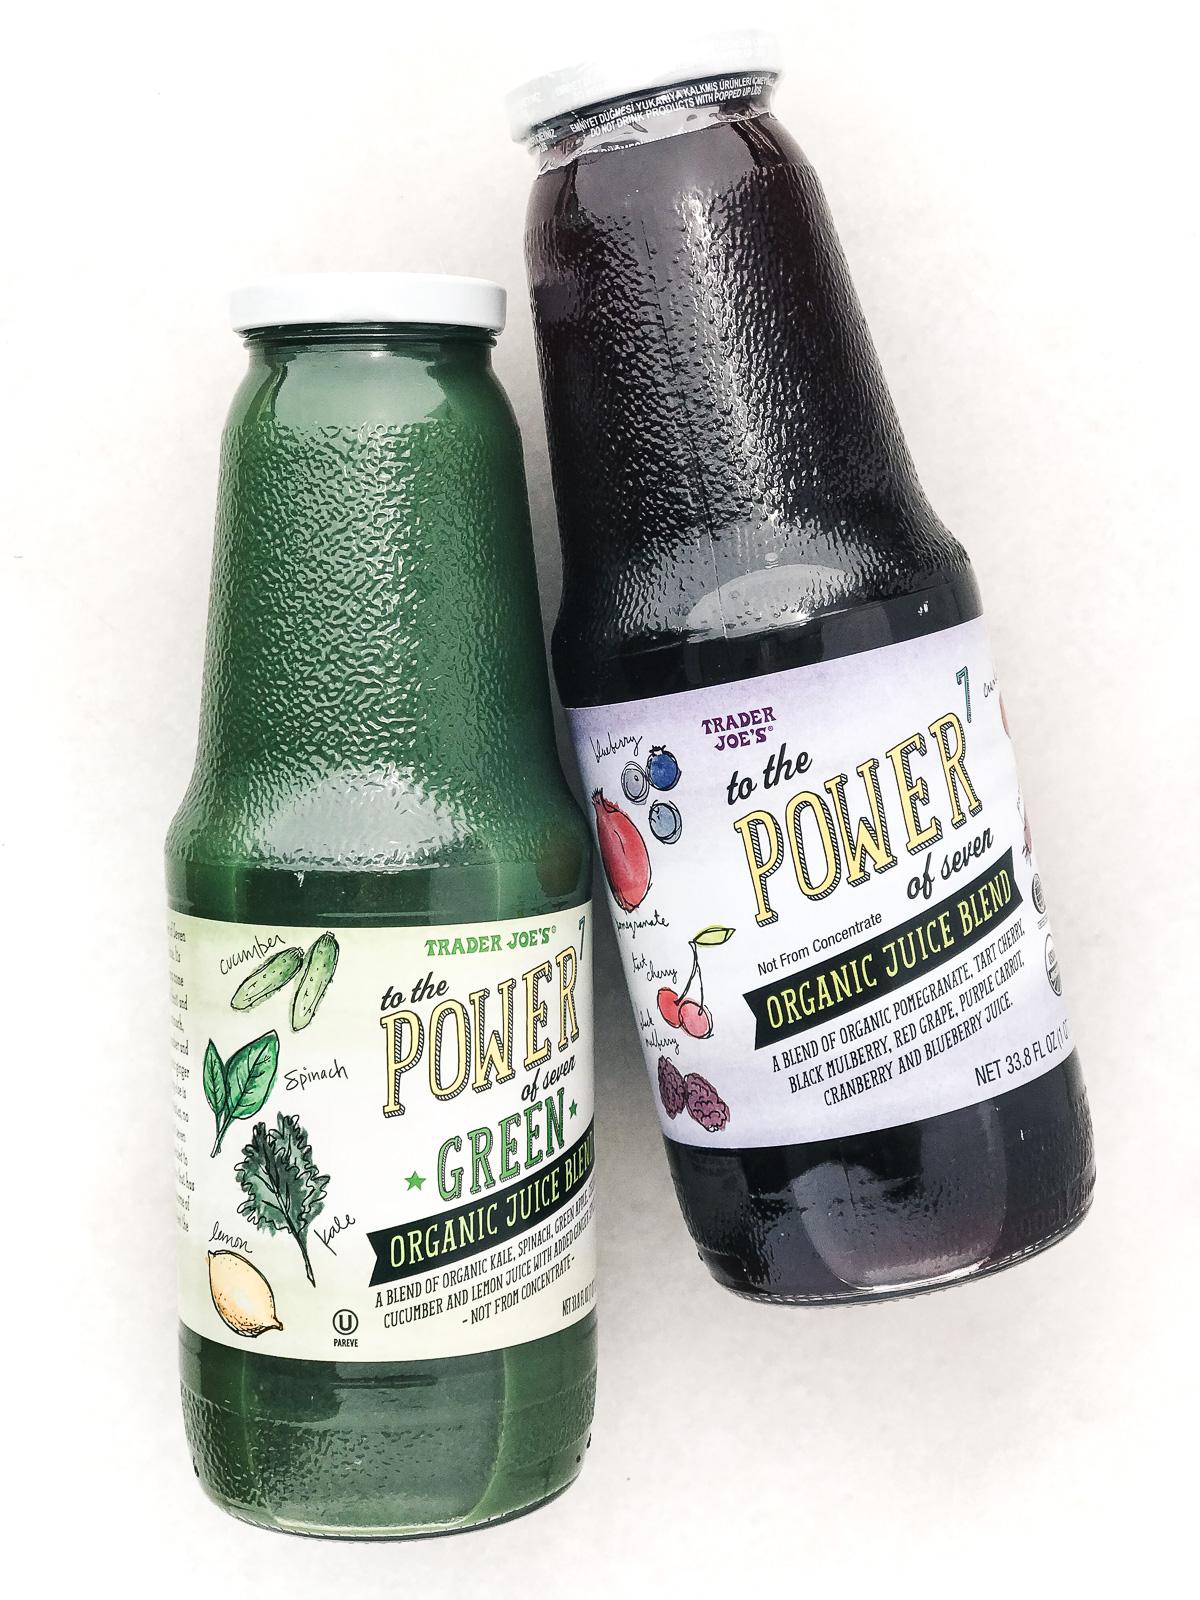 Trader Joe's fruit juices